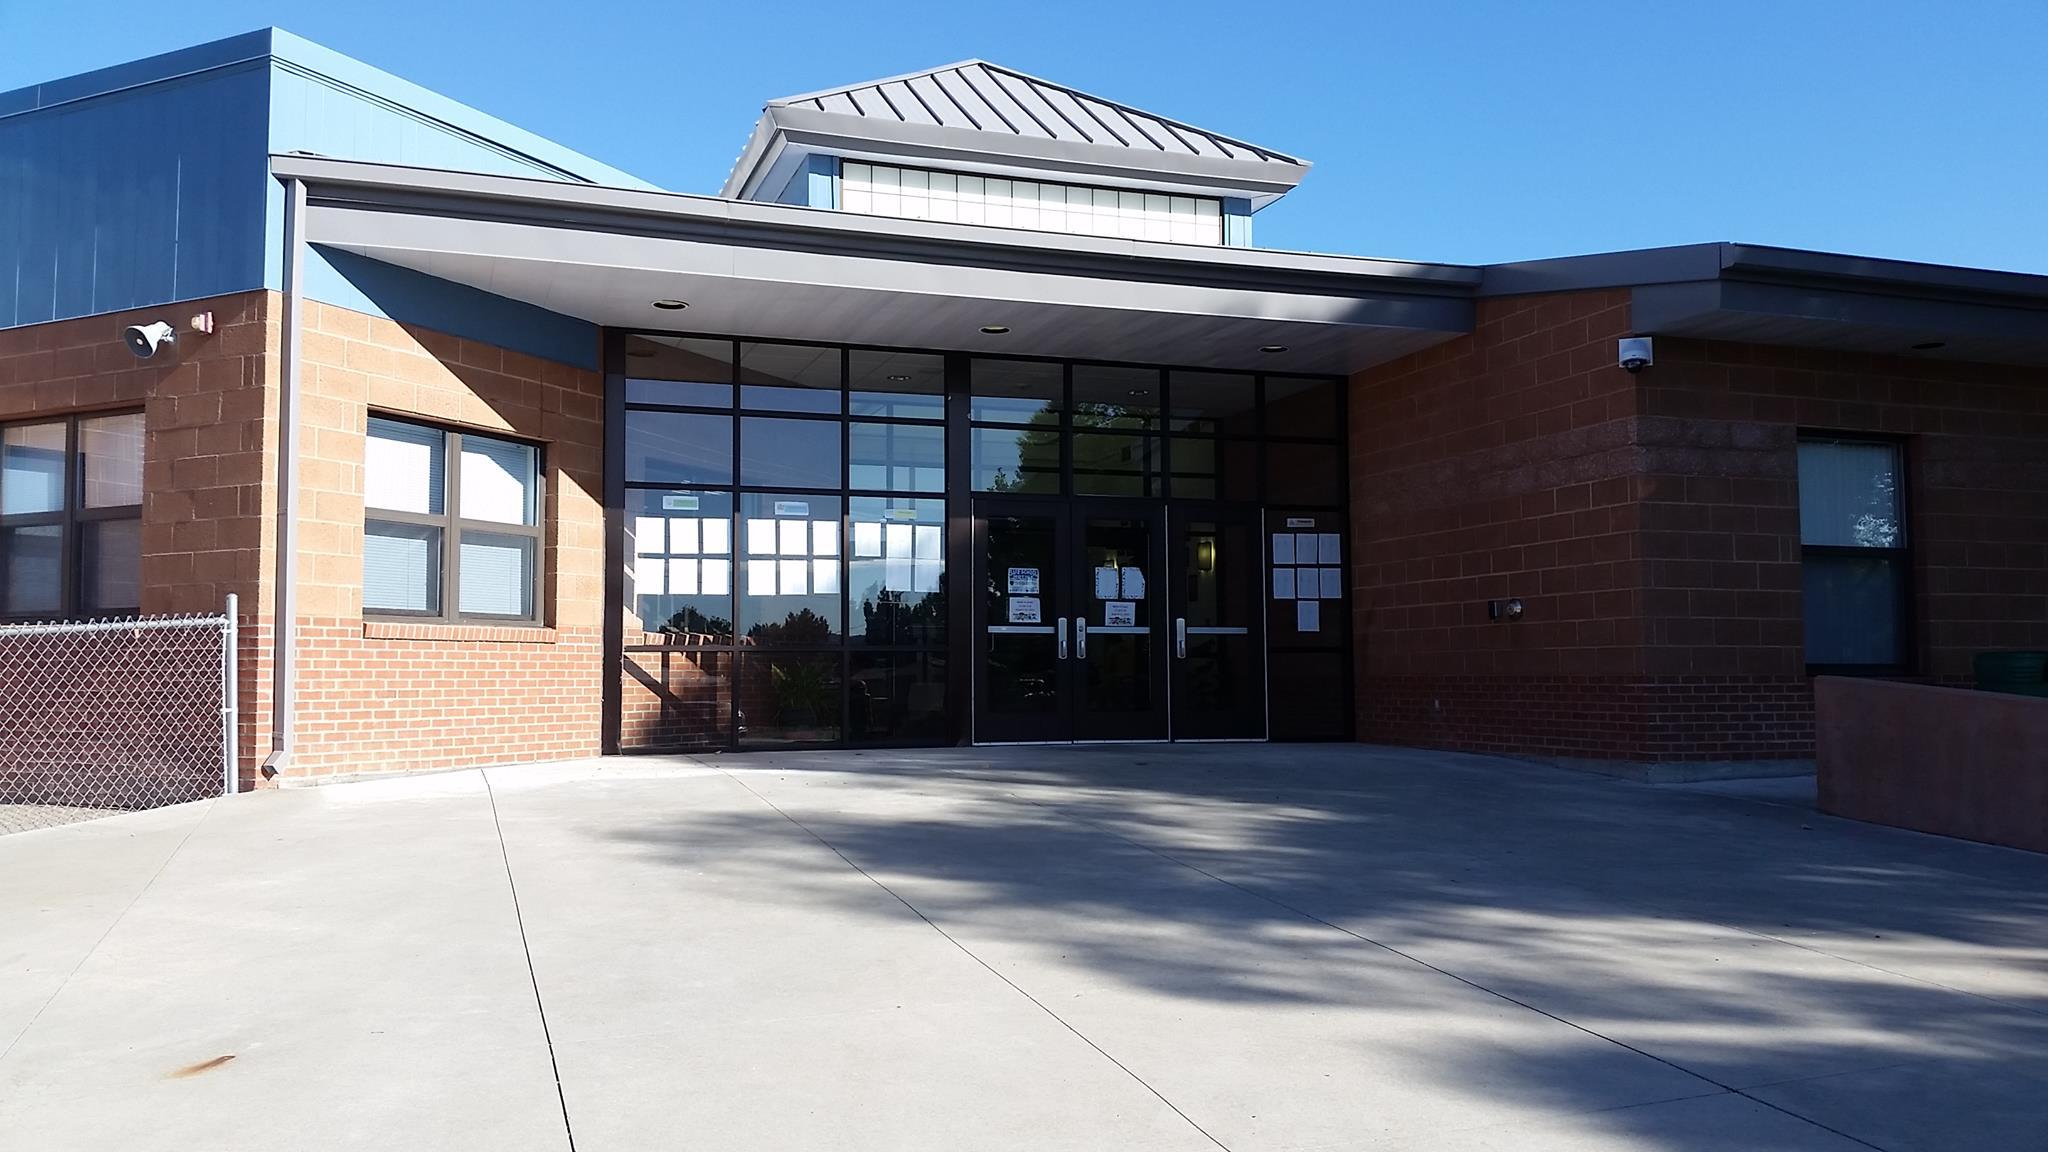 Main Entrance of school